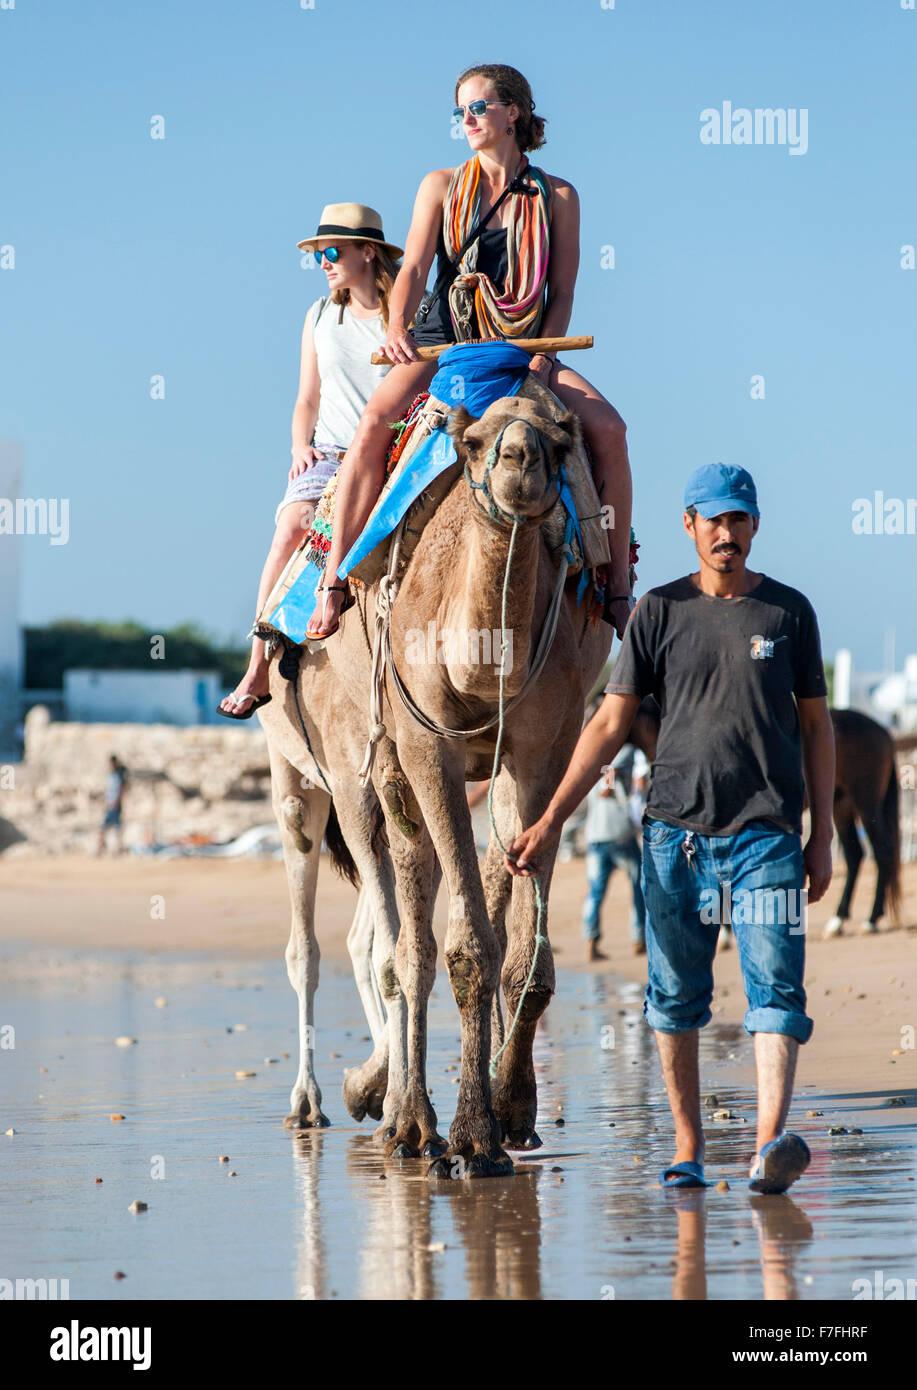 Touristen, Kamelreiten entlang der Wasserkante von Sidi Kaouki Beach in Marokko. Stockbild